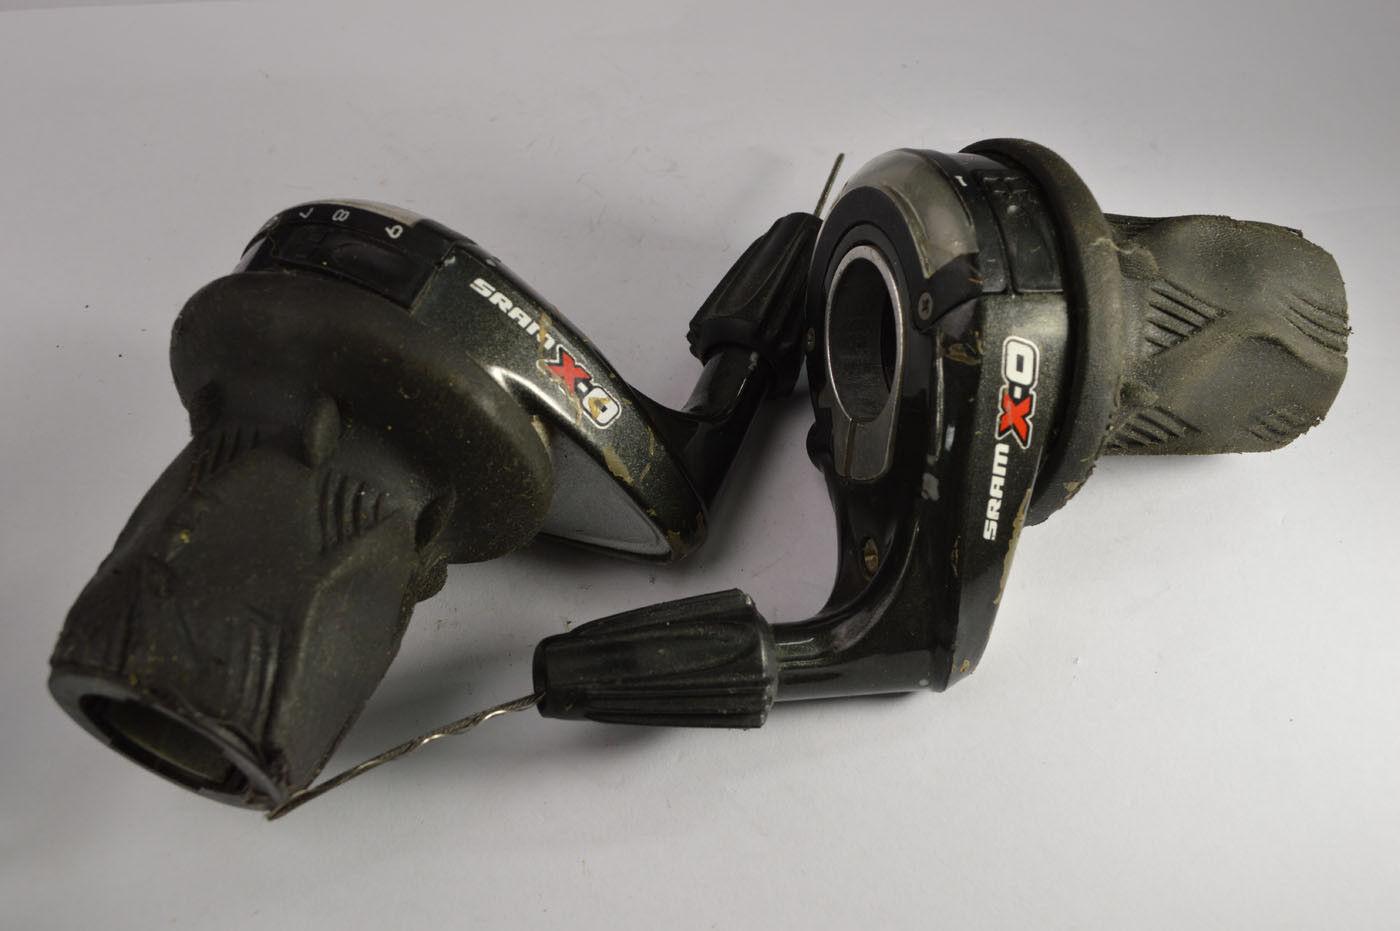 Rotary grip shifters SRAM X.0 ( 907-90  ) 9-3 MTB TREKKING 170 g